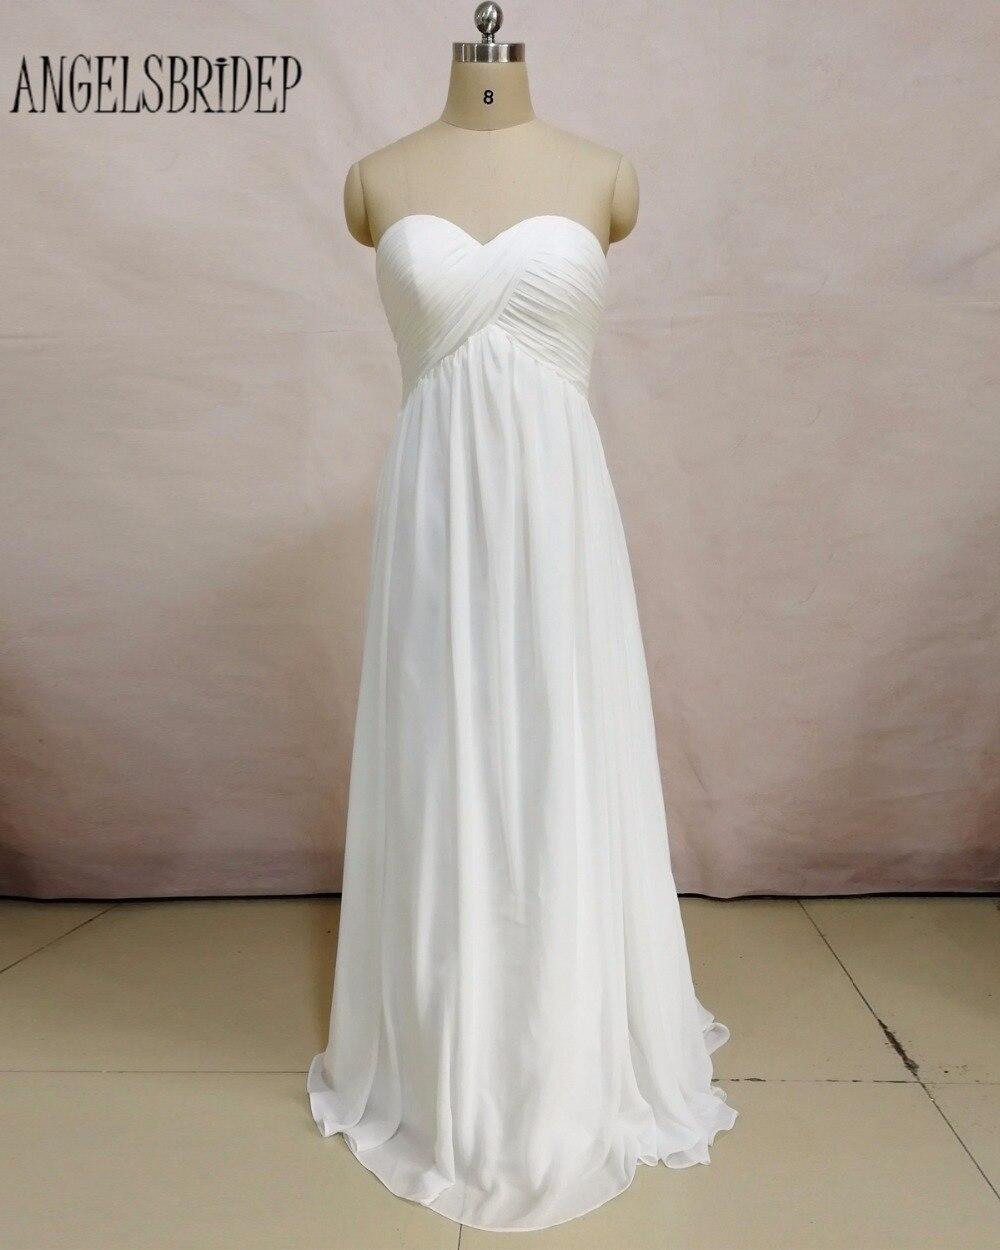 ANGELSBRIDEP Beach Wedding Dresses 2018 Long Chiffon Wedding Gowns White Ivory Sweetheart Formal Bridal Gown vestido de noiva